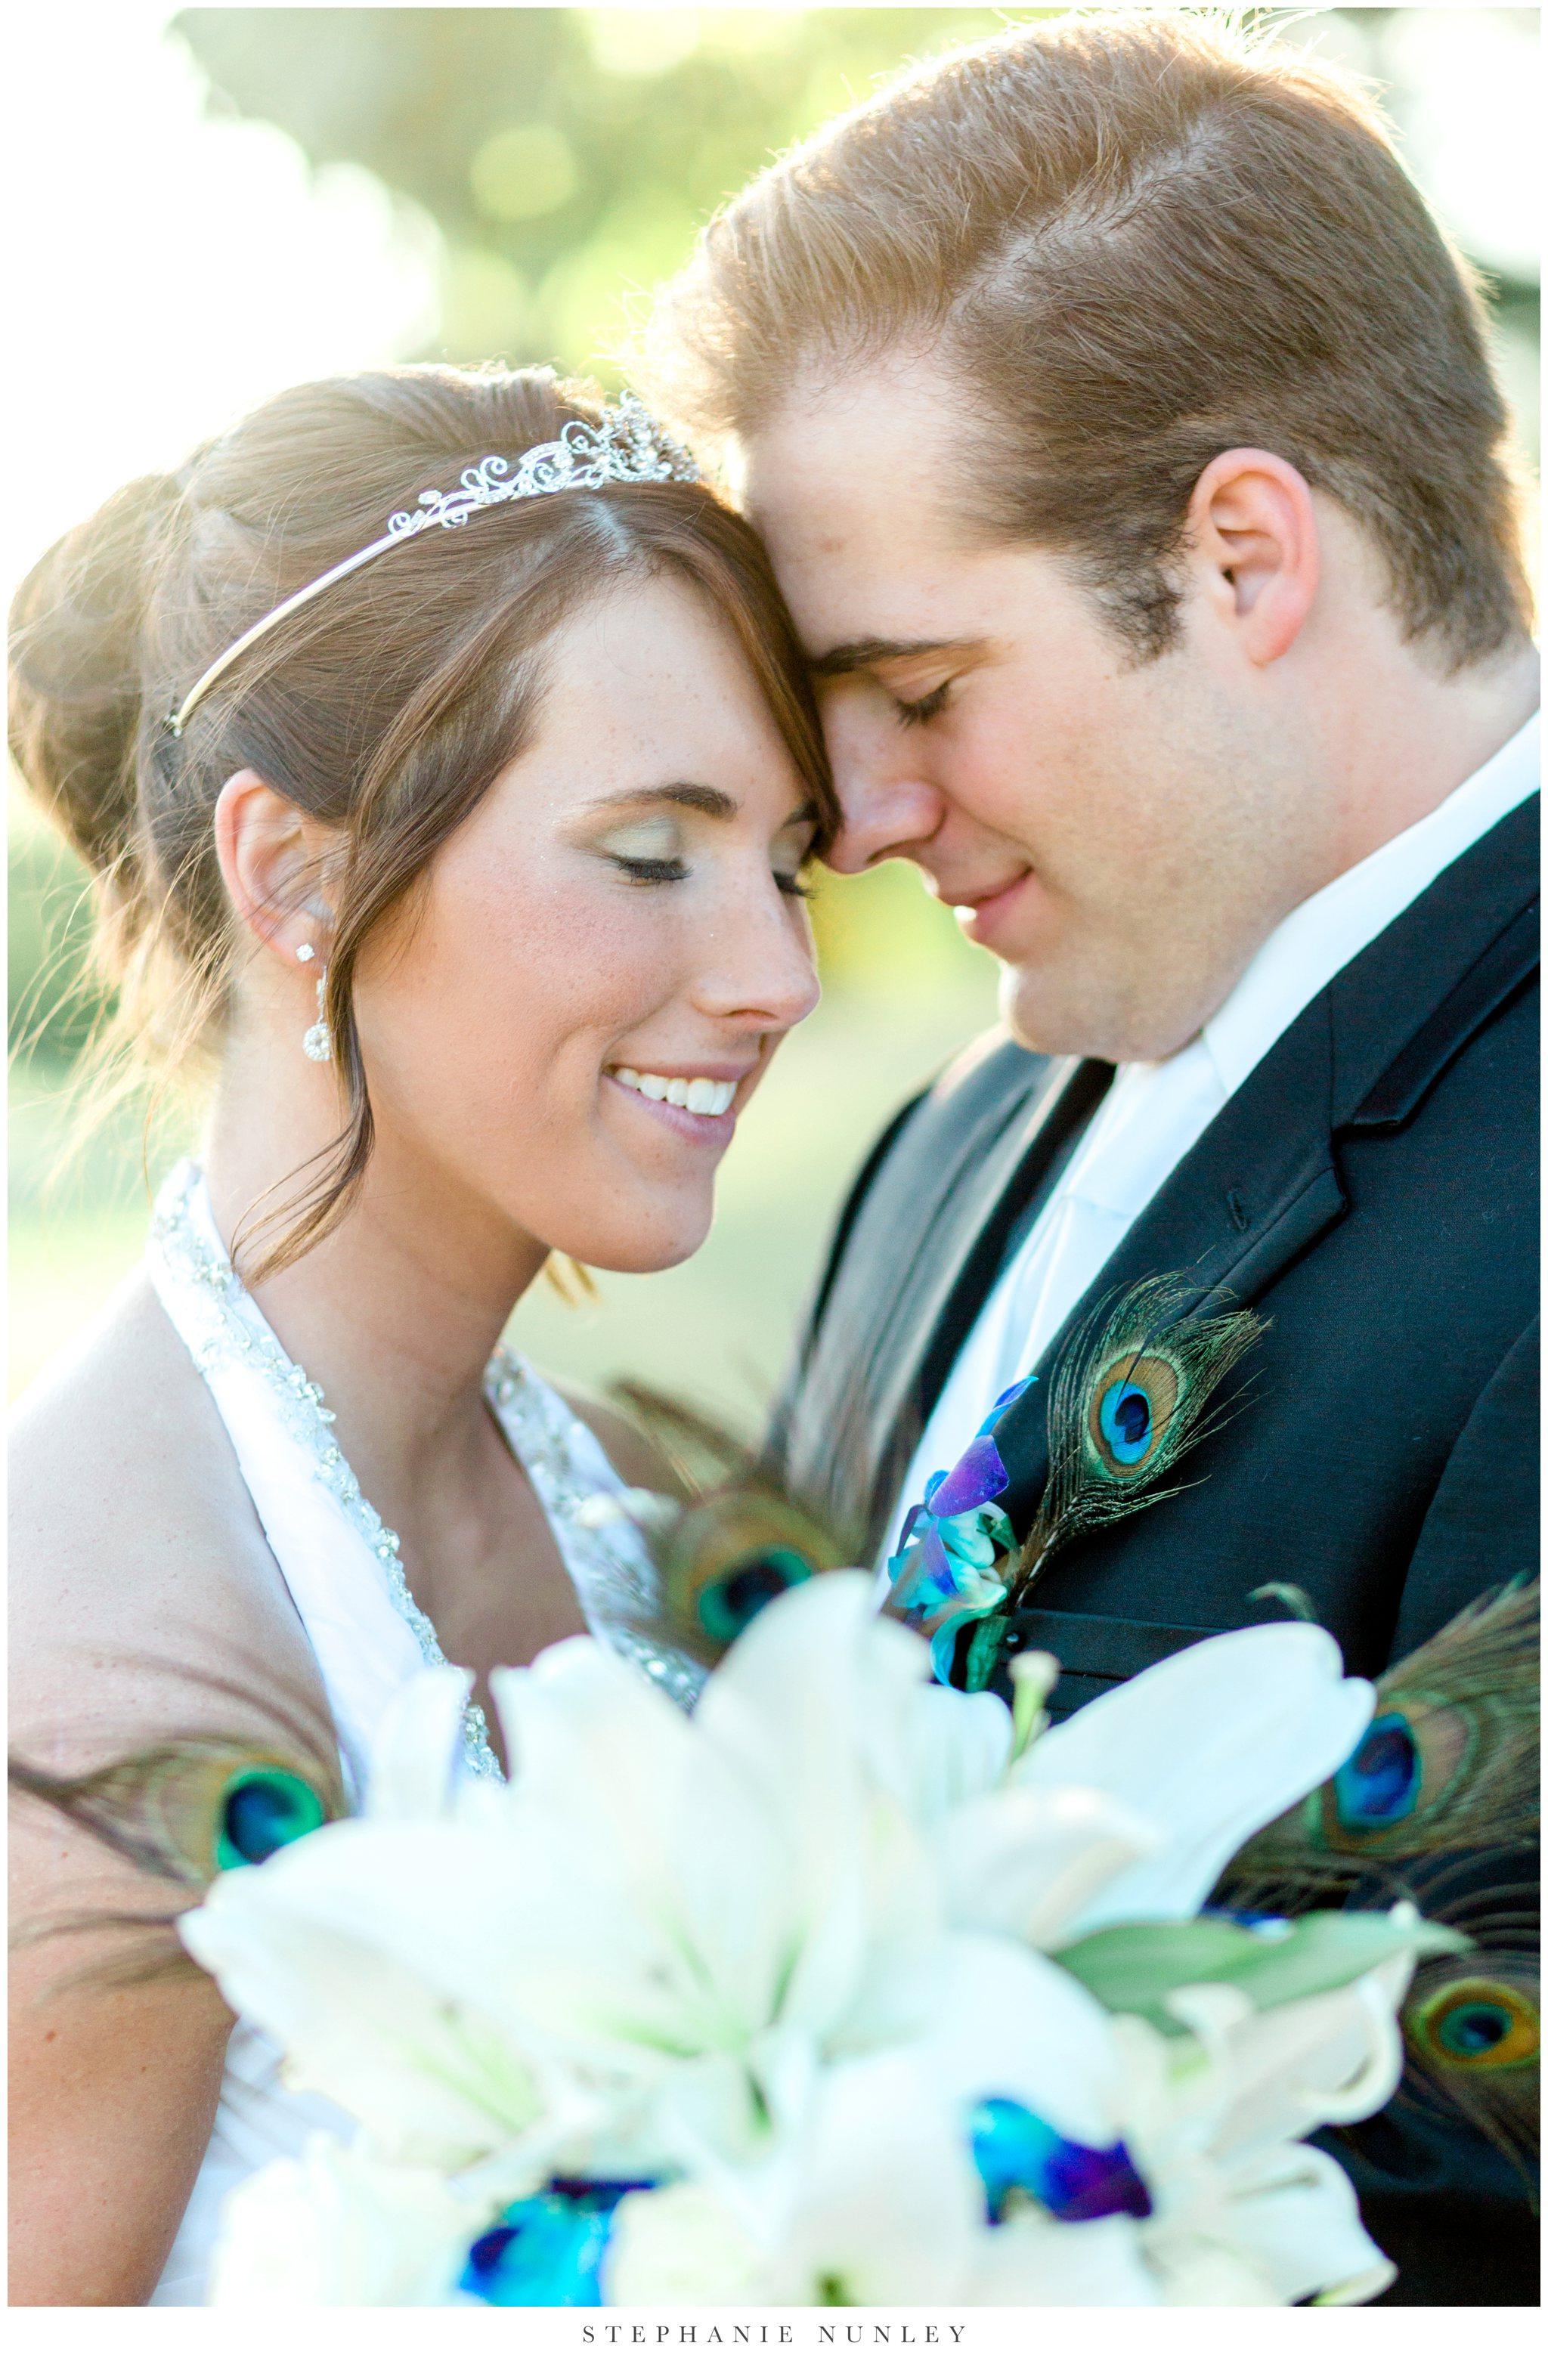 fine-art-destination-wedding-photographer-0077.jpg